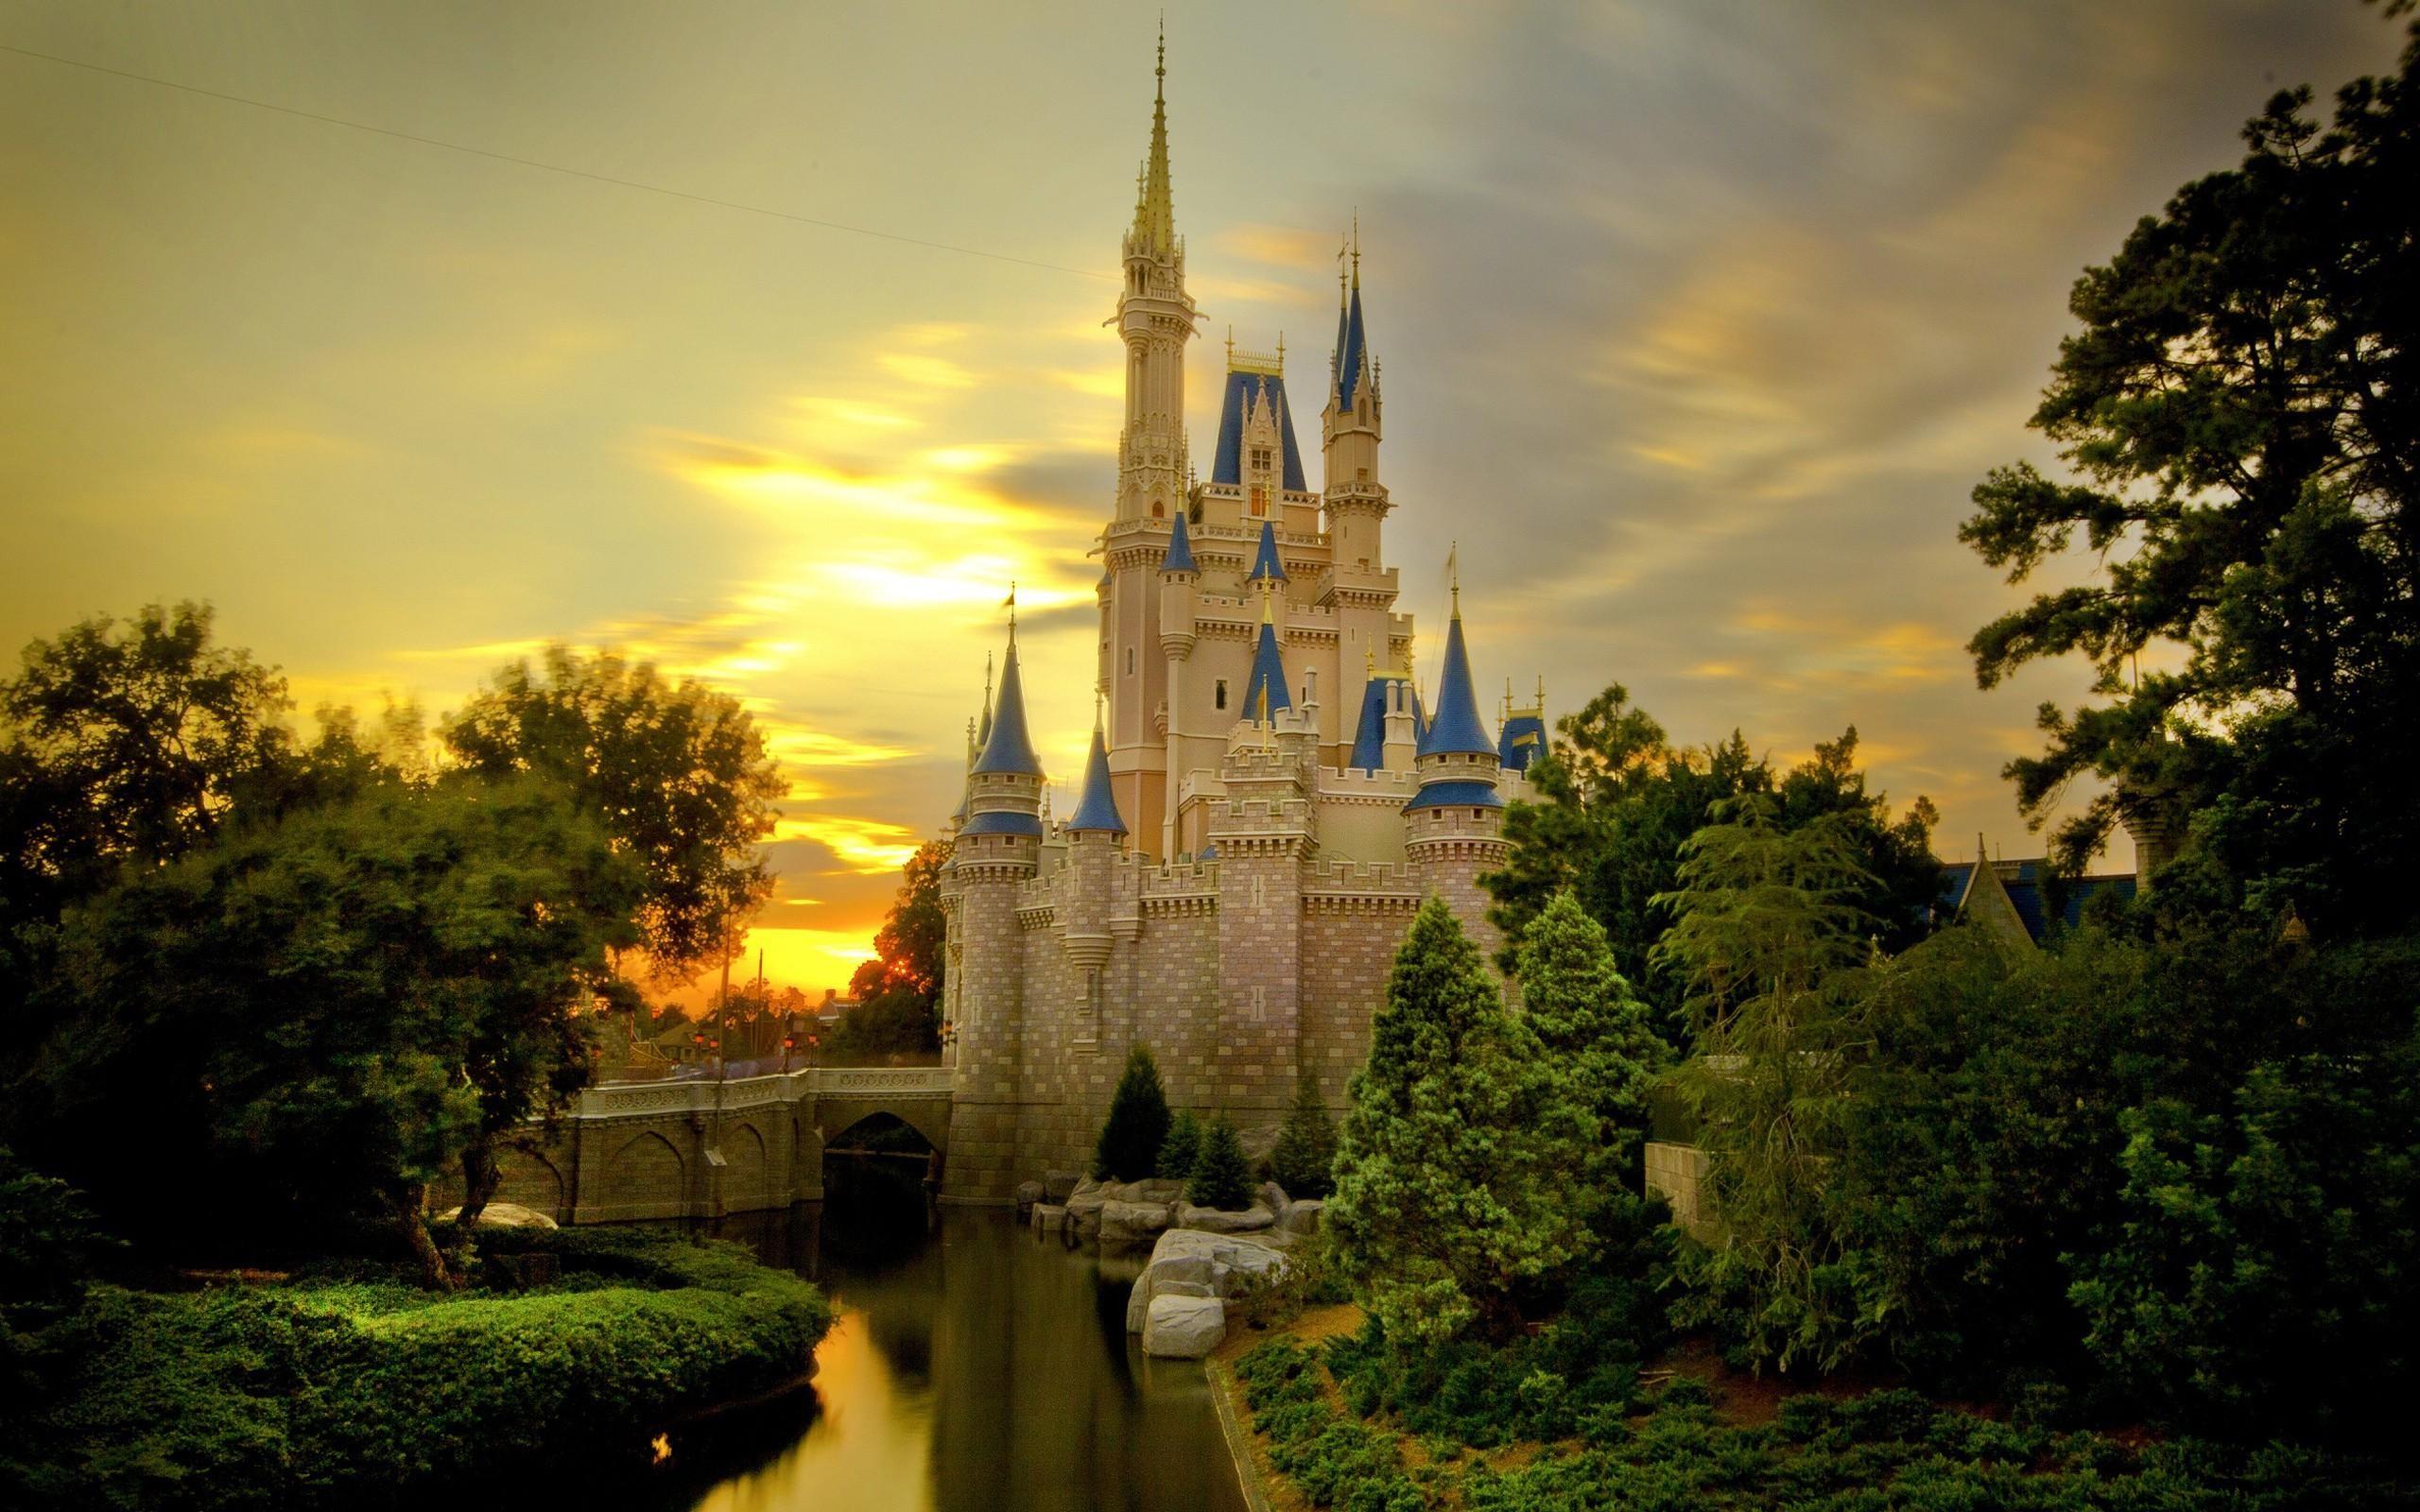 Beautiful Cinderella Castle Image Download HD Wallpapers 2560x1600